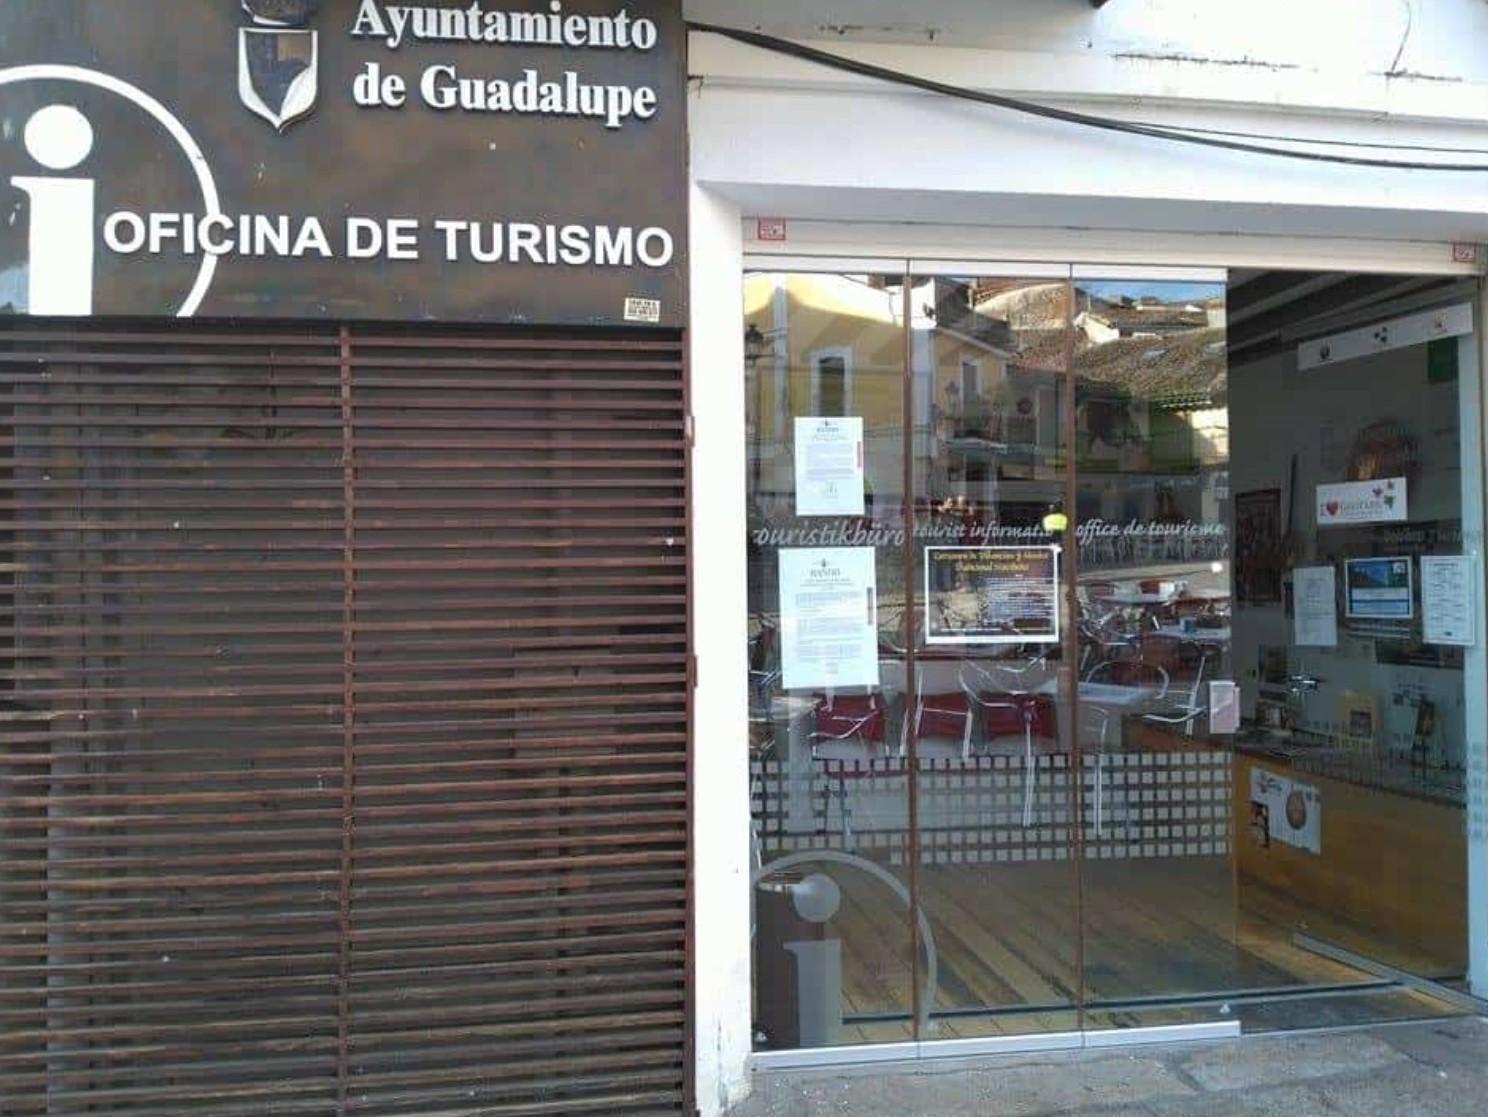 Oficina de Turismo de Guadalupe